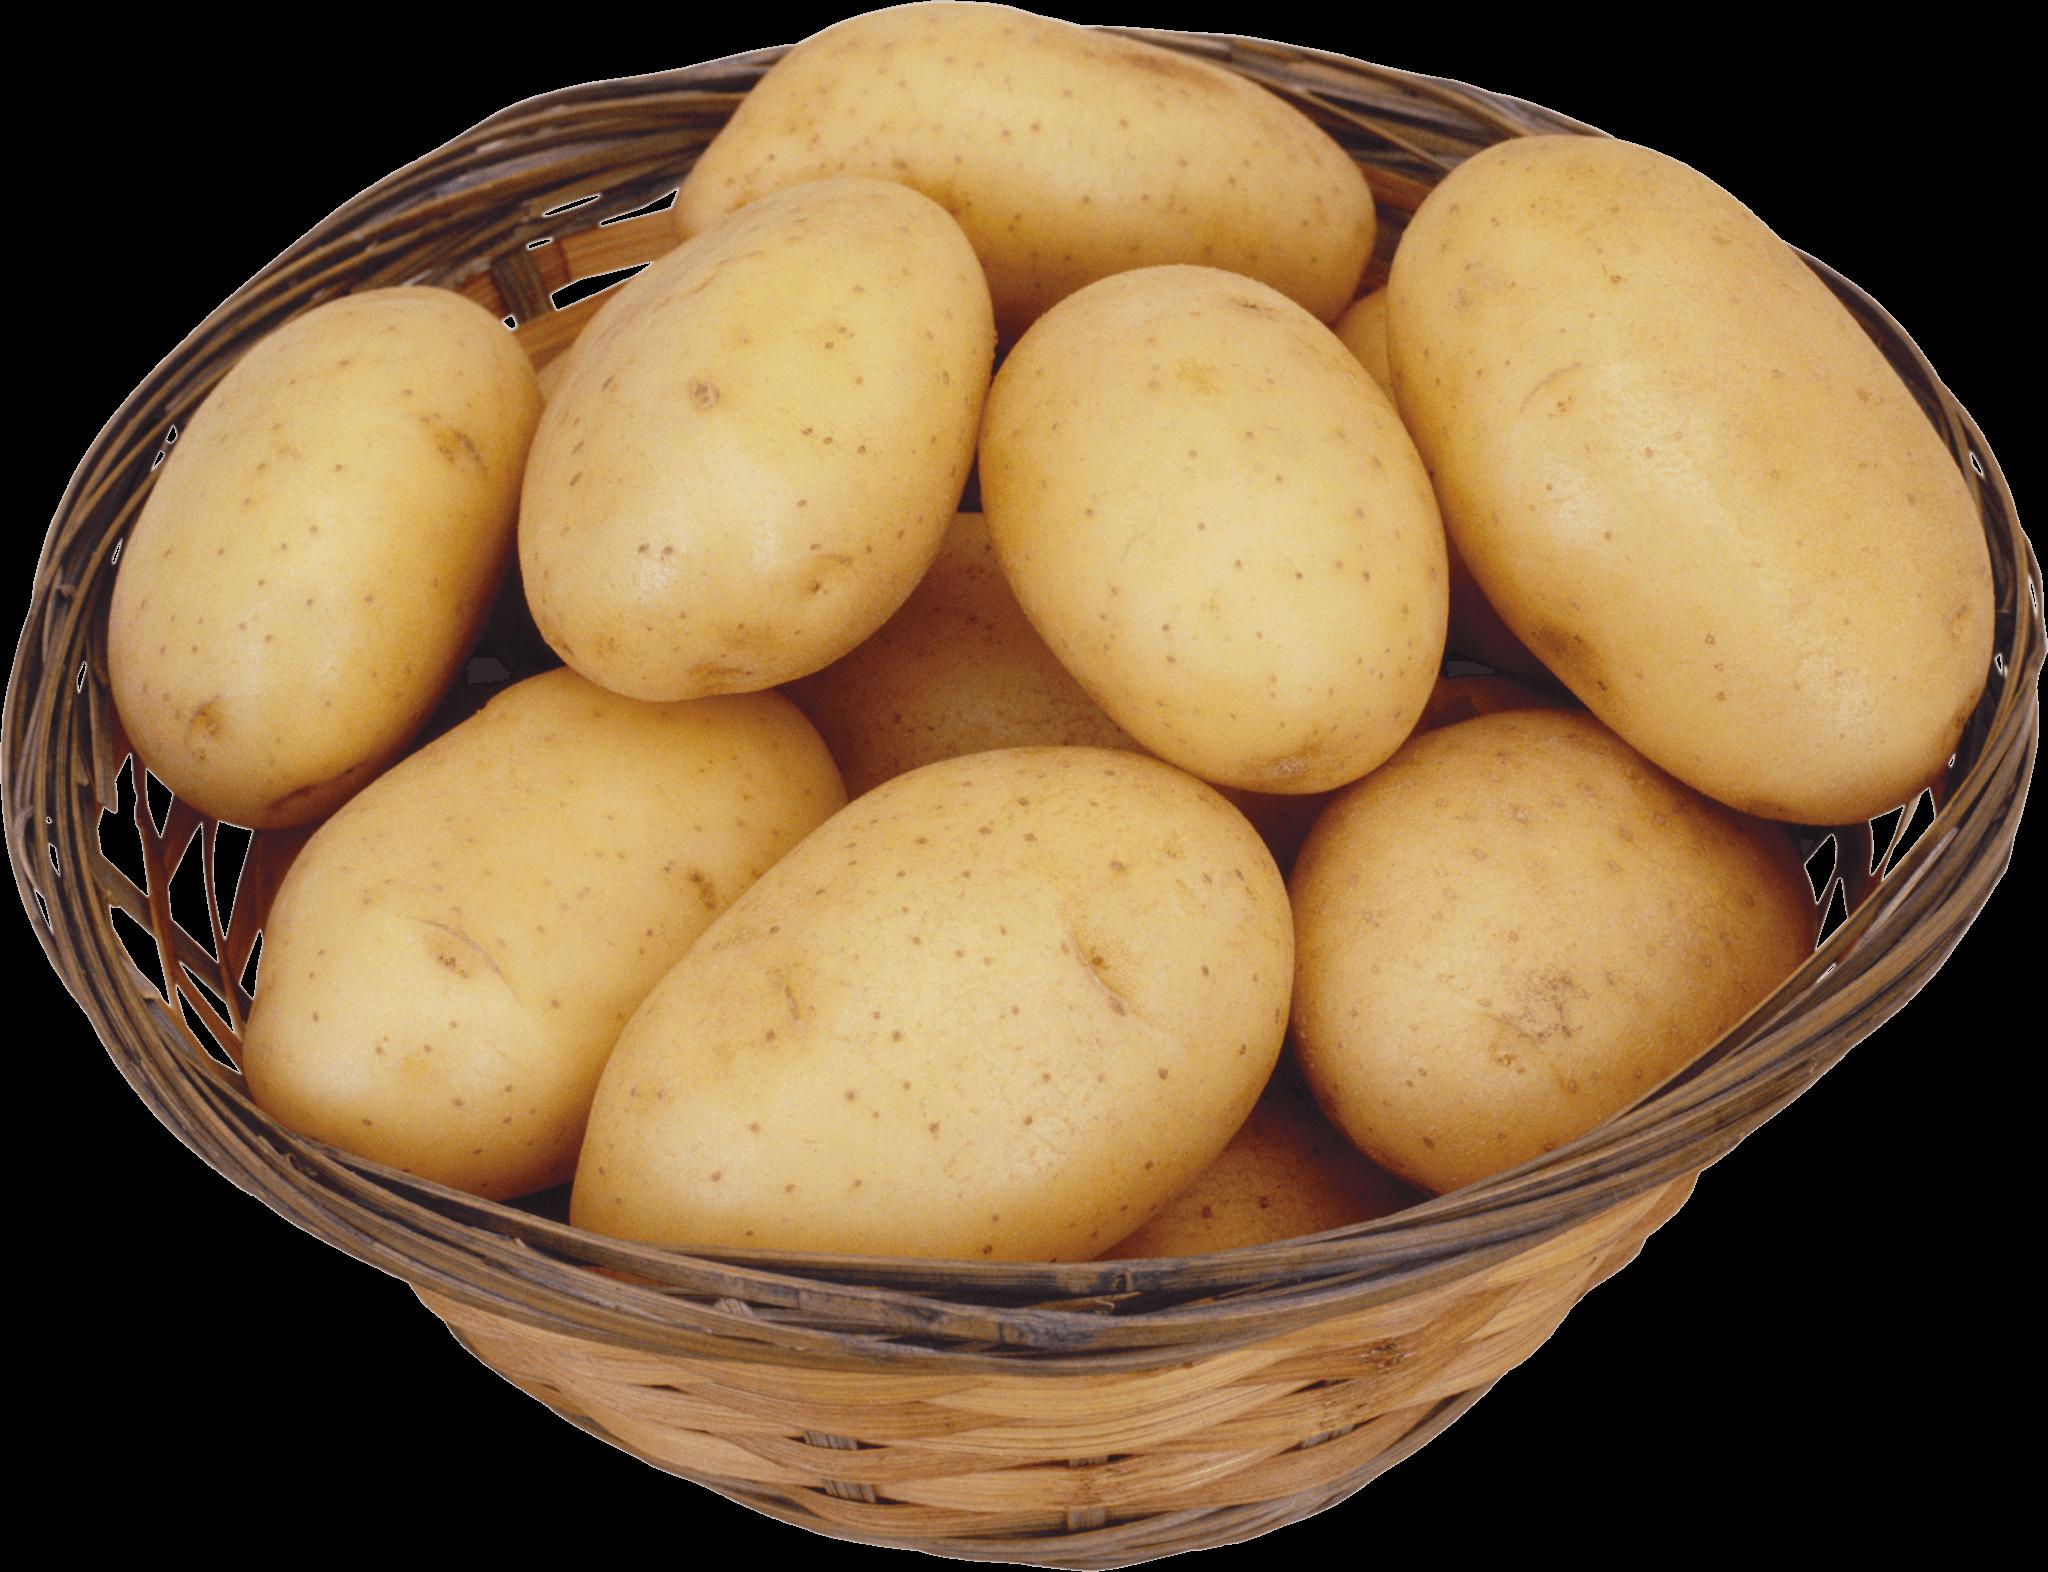 Potatoes to lighten dark armpits, elbows and knees